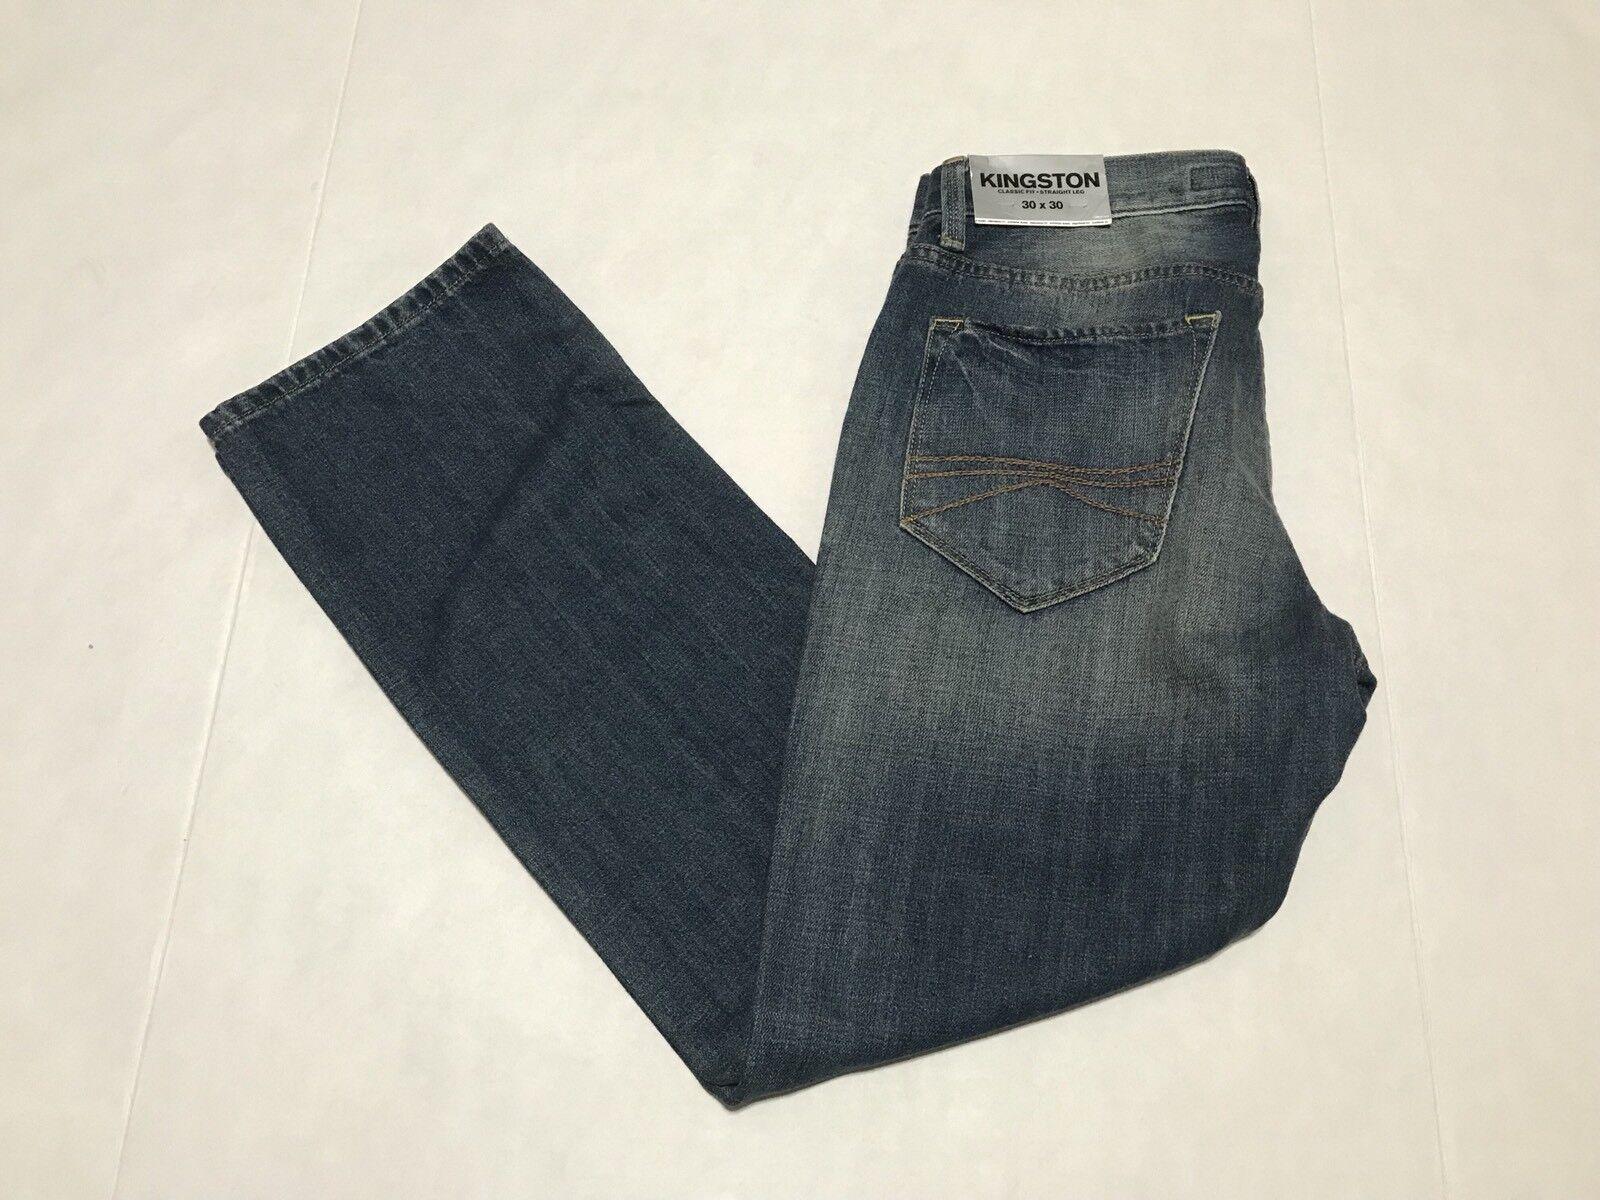 NWT Express Mens Kingston Classic Fit Straight Leg Jeans 30x30